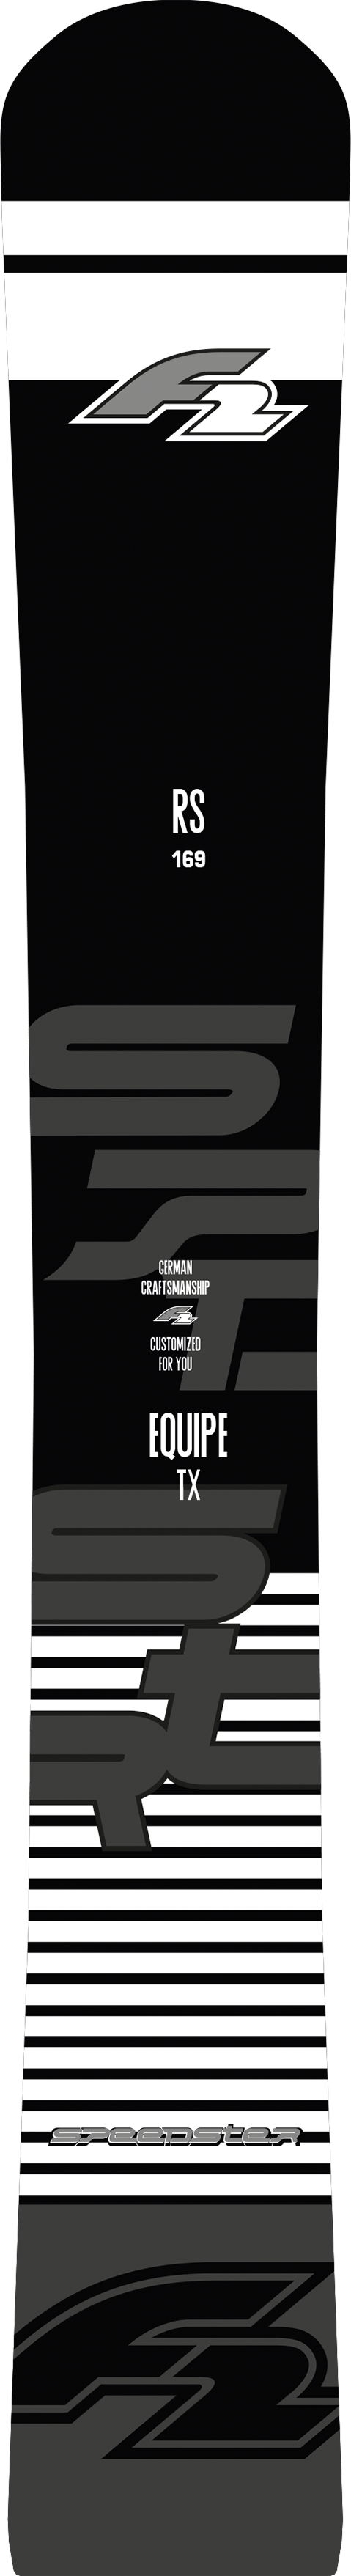 SPEEDSTER EQUIPE RS TX CARBON - Top